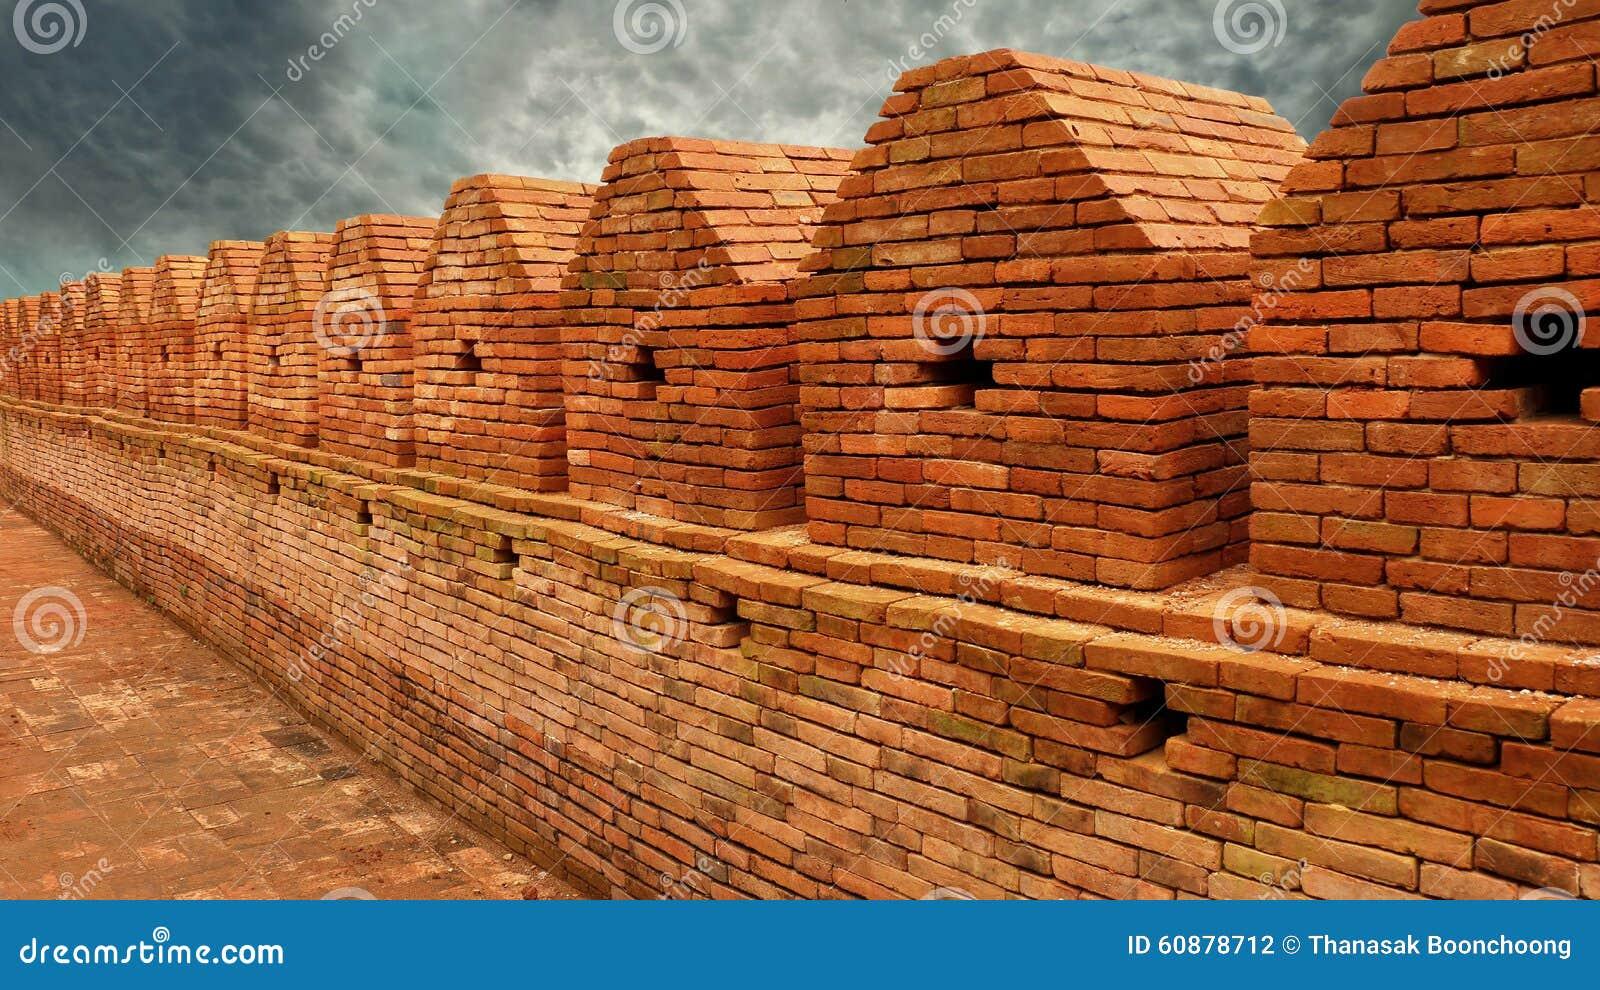 Ancient City Brick Wall Stock Photo - Image: 60878712